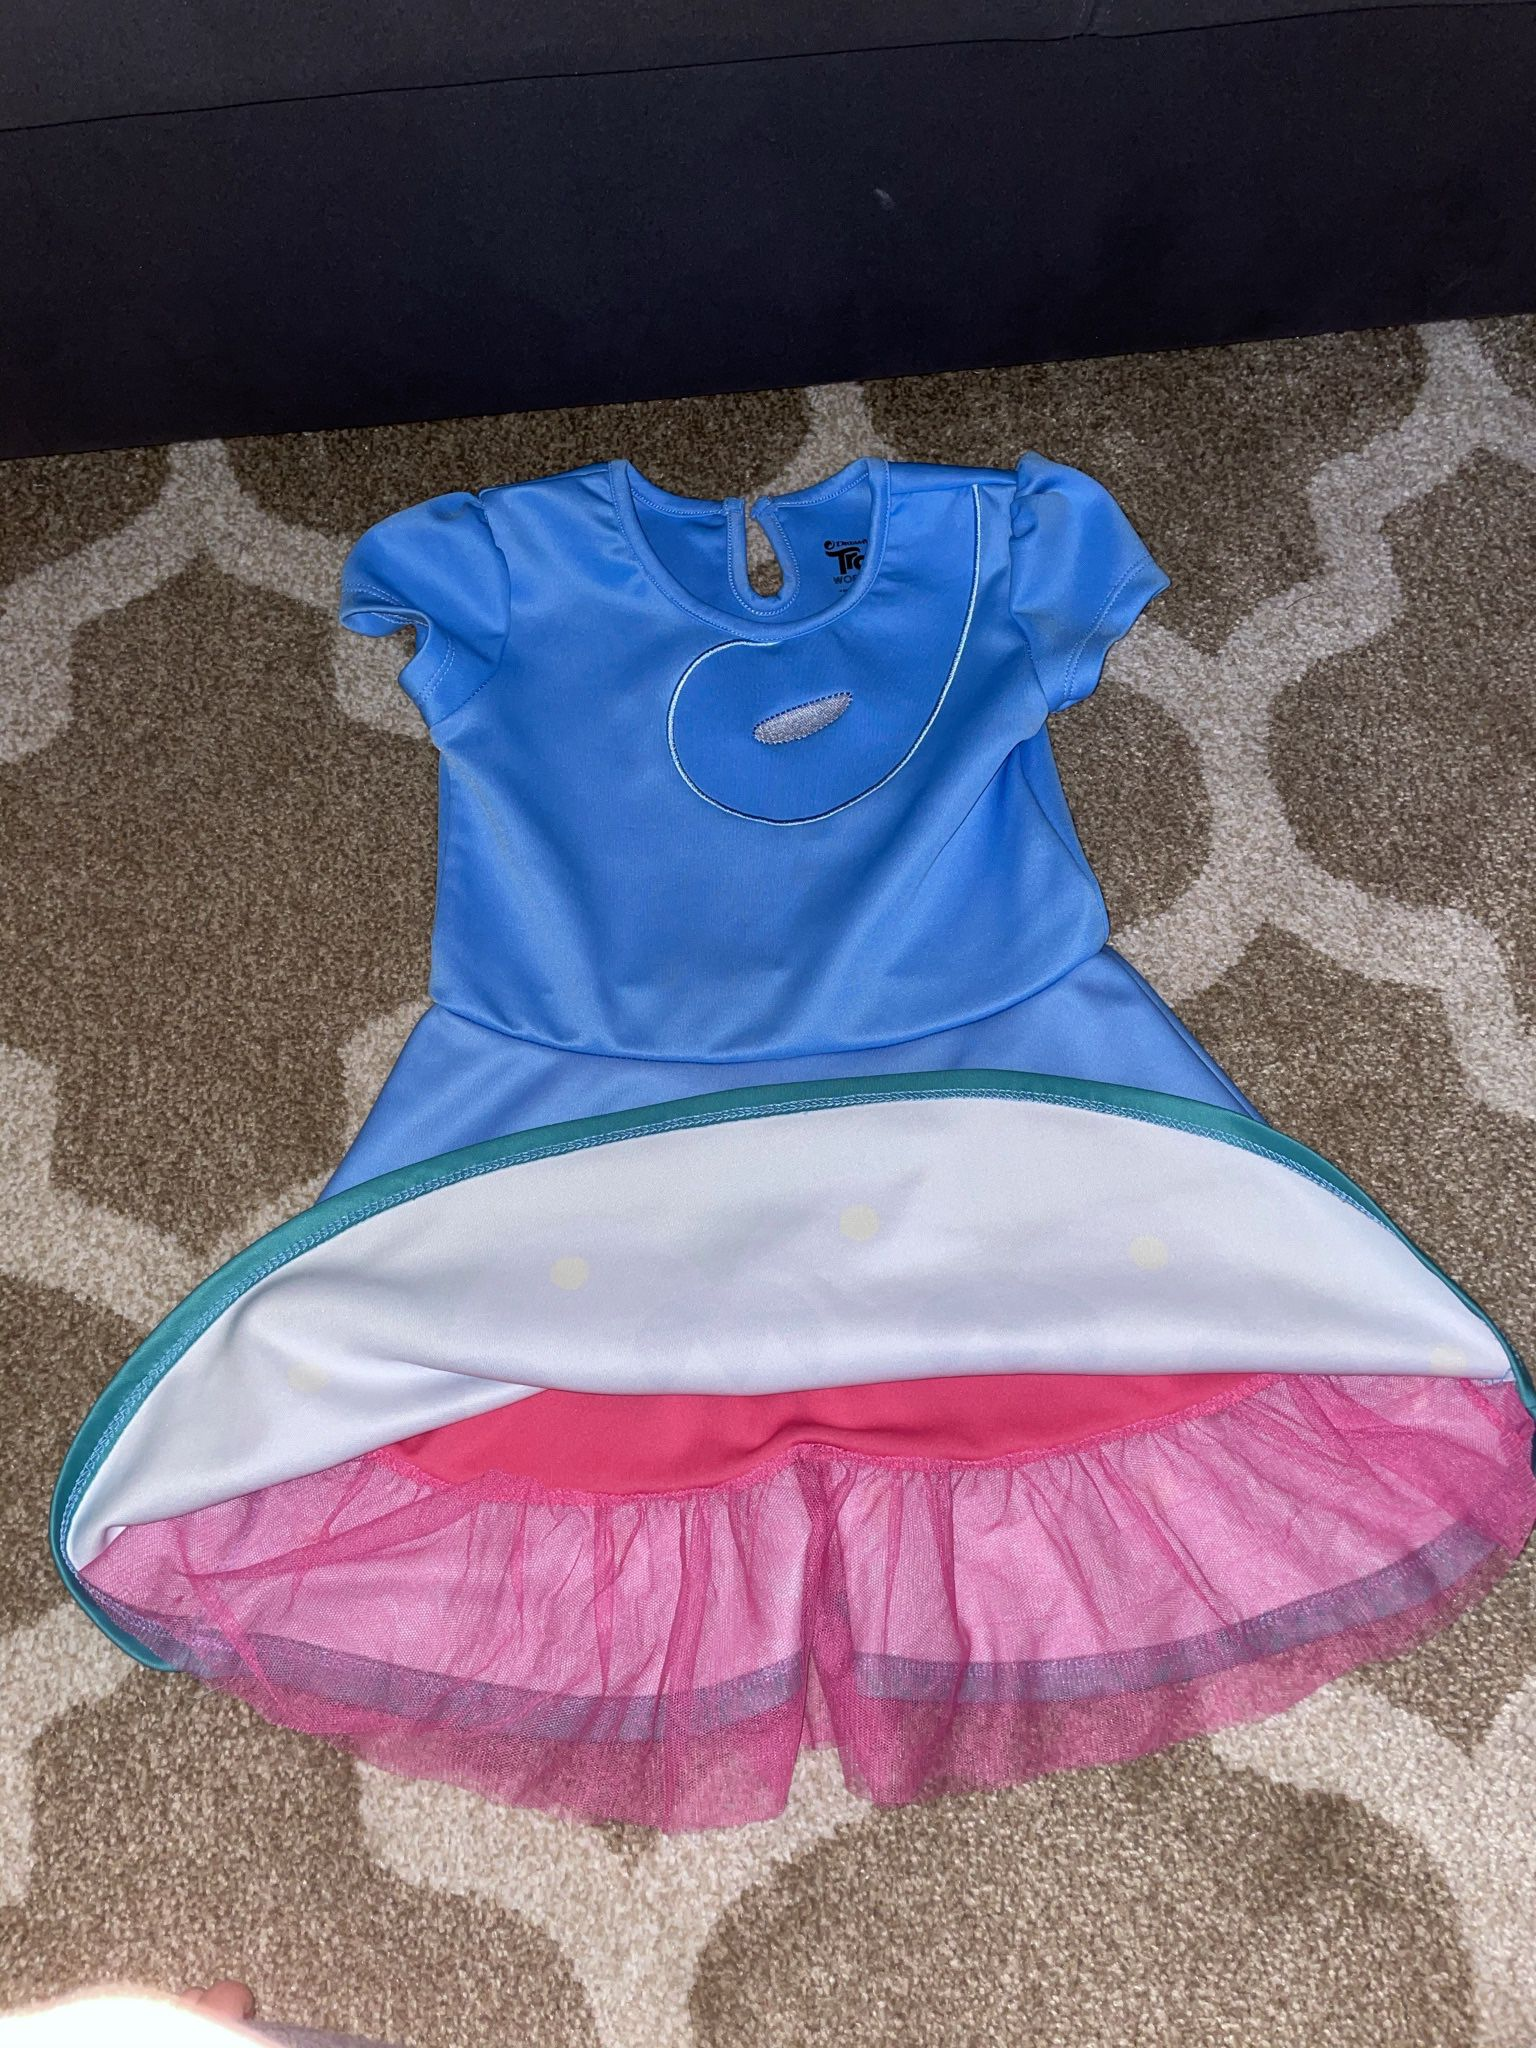 Trolls Poppy Dress 5/6